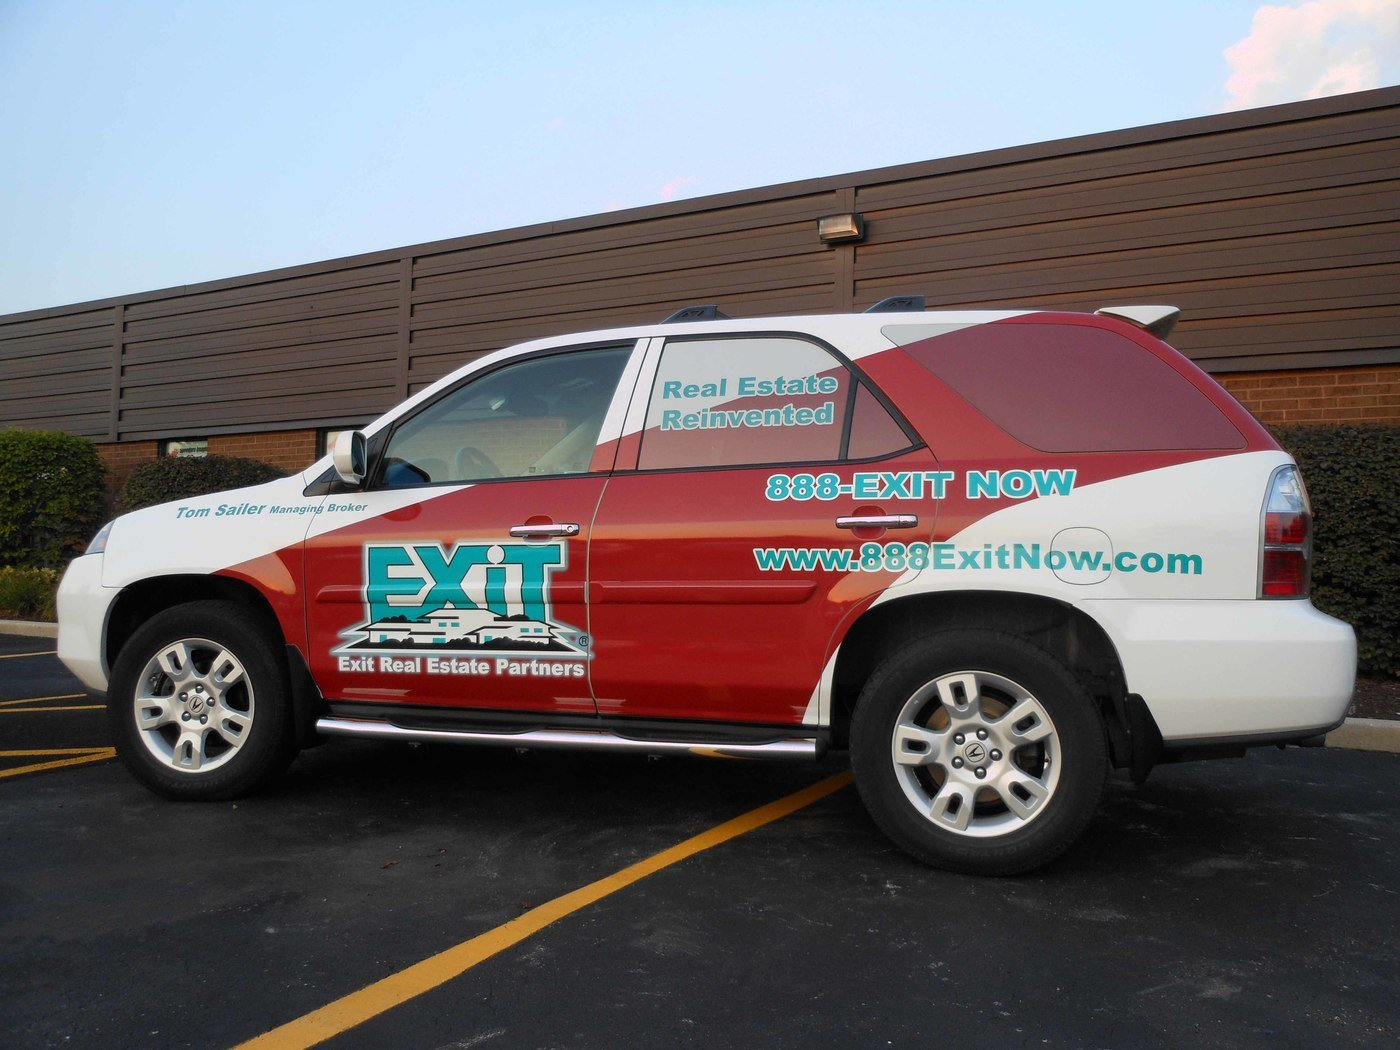 Car Real Estate: Vehicle Wraps By Tim McDonald At Coroflot.com